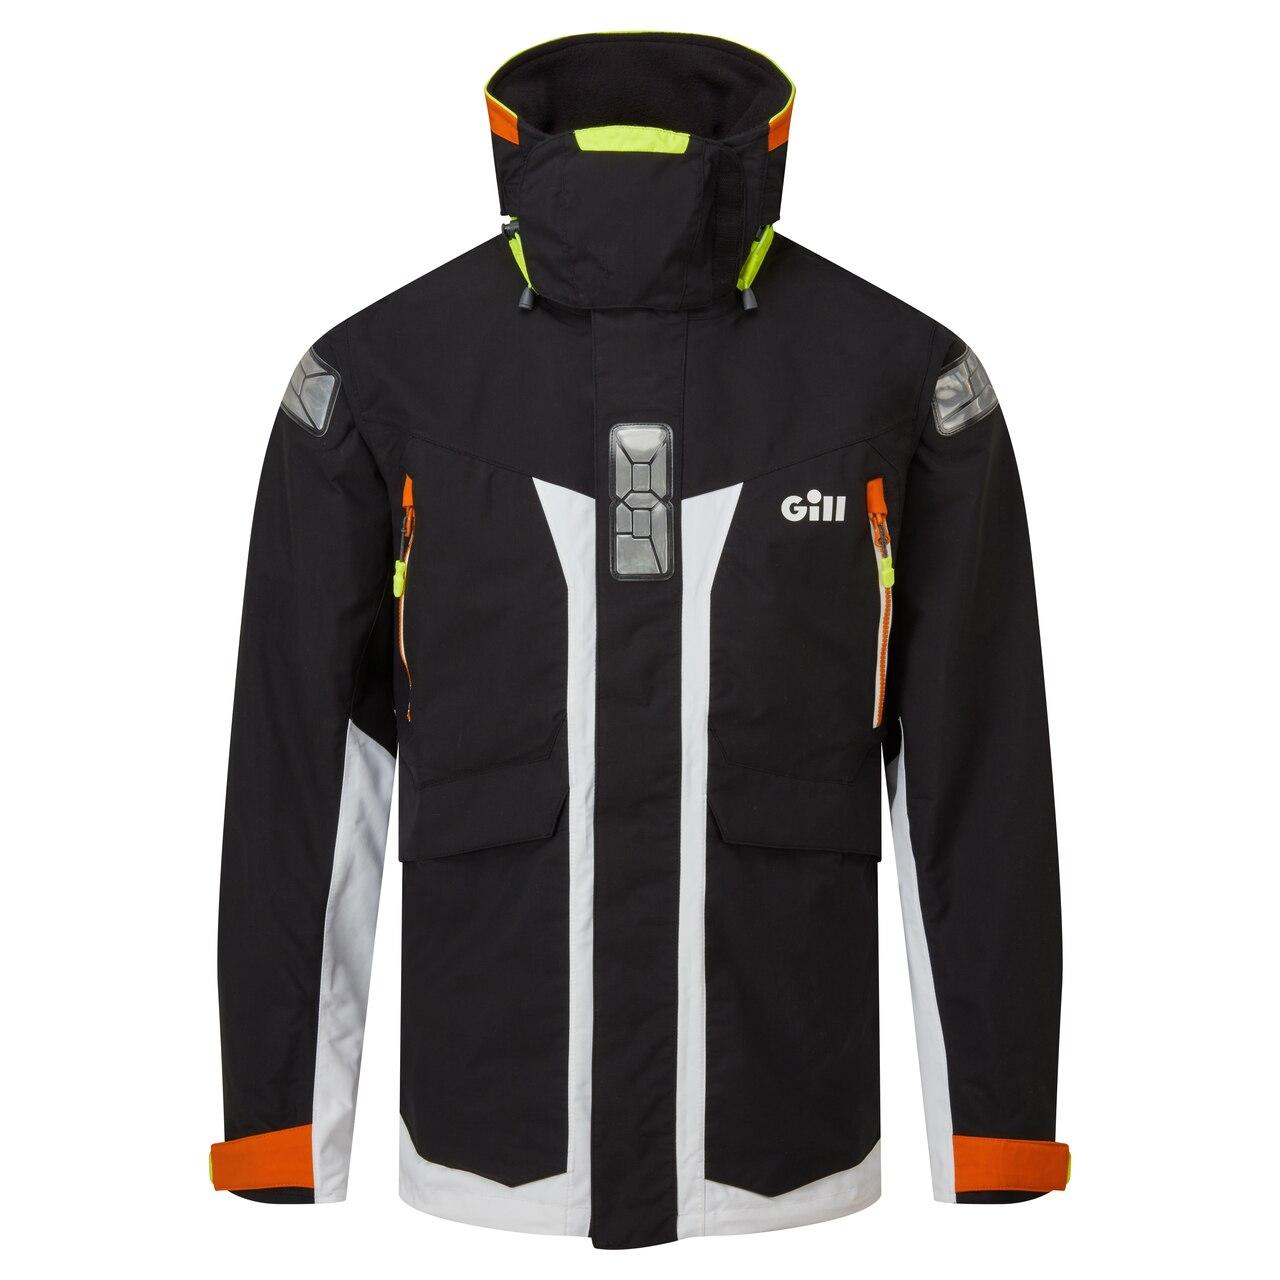 OS2 Offshore Men's Jacket - OS24J-BLKLTD_1.jpg